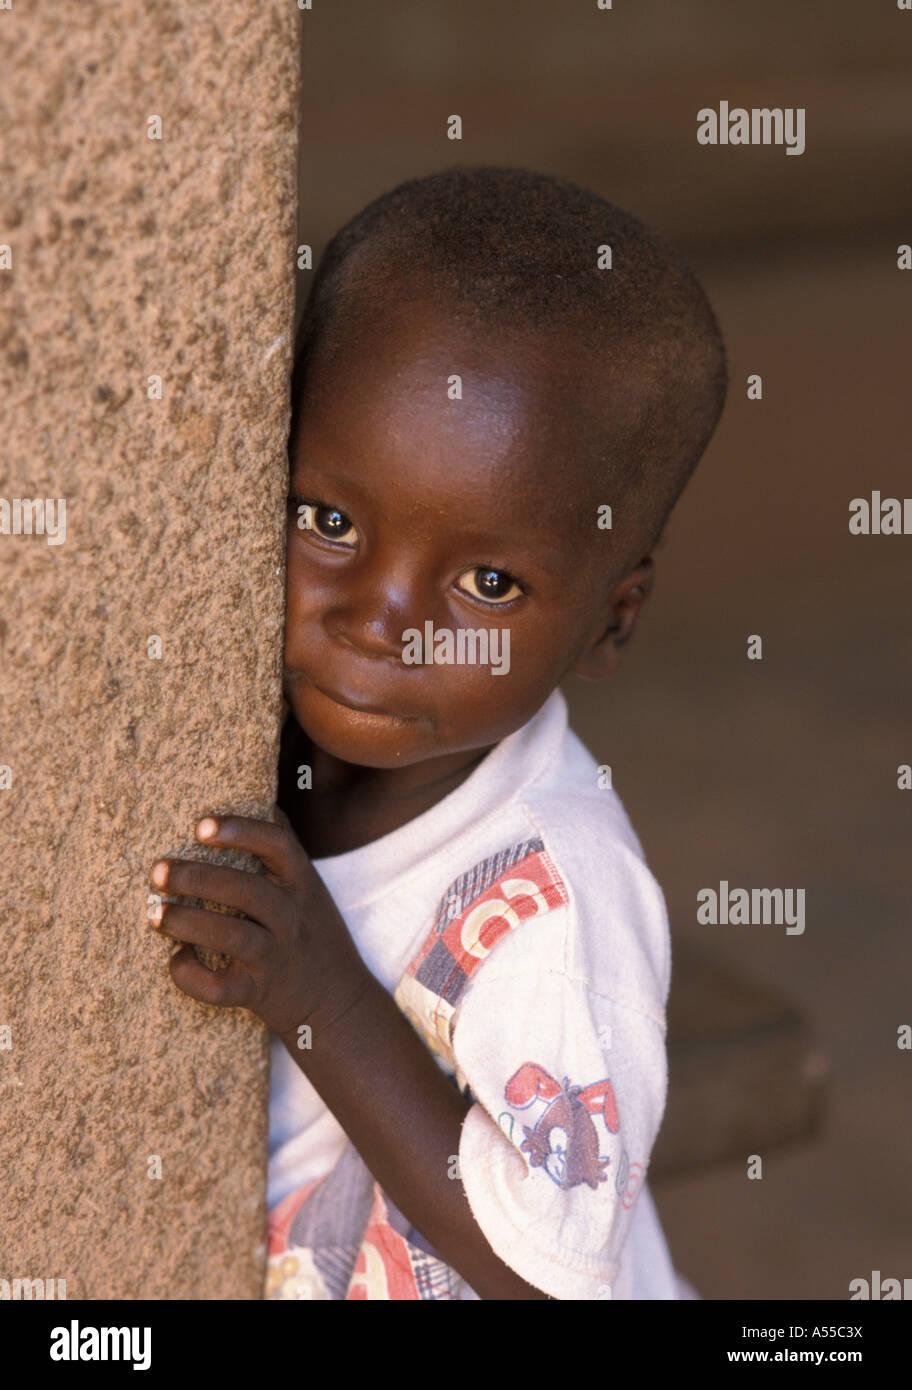 Painet ik0237 burkina faso child ouagadougou country developing nation less economically developed culture emerging Stock Photo